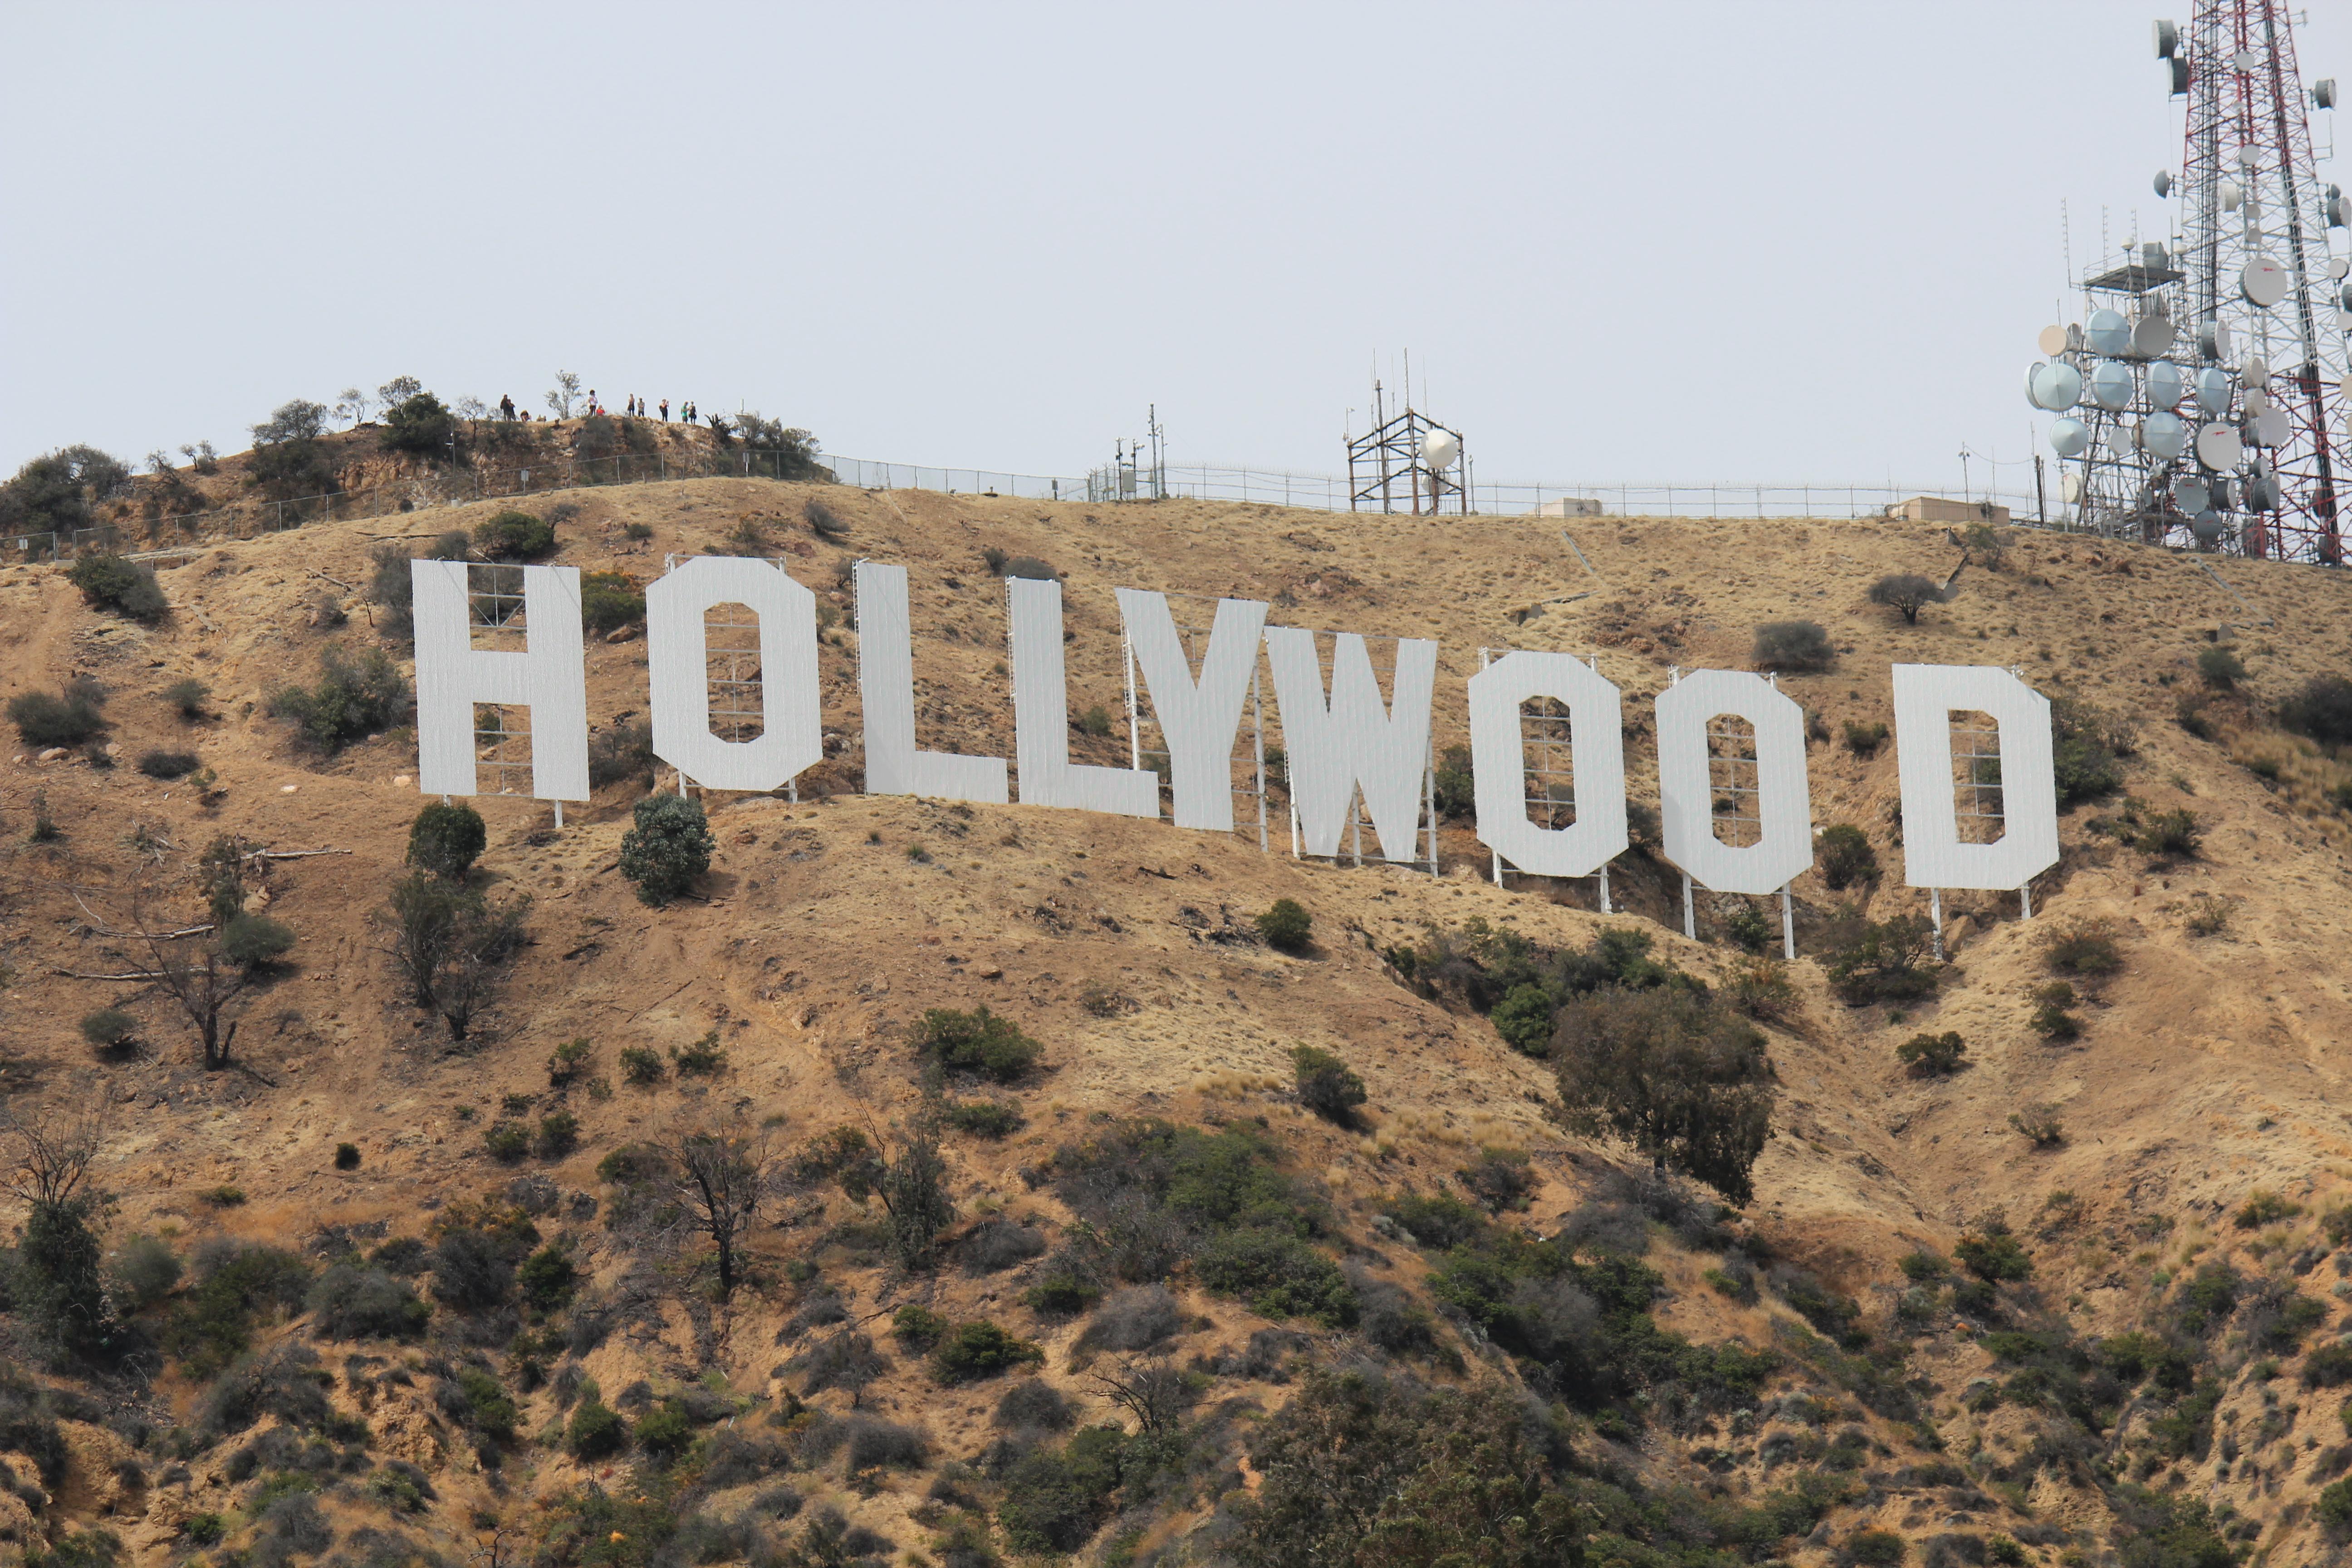 Hollywoodskiltet, Hollywood Los Angeles, Californien